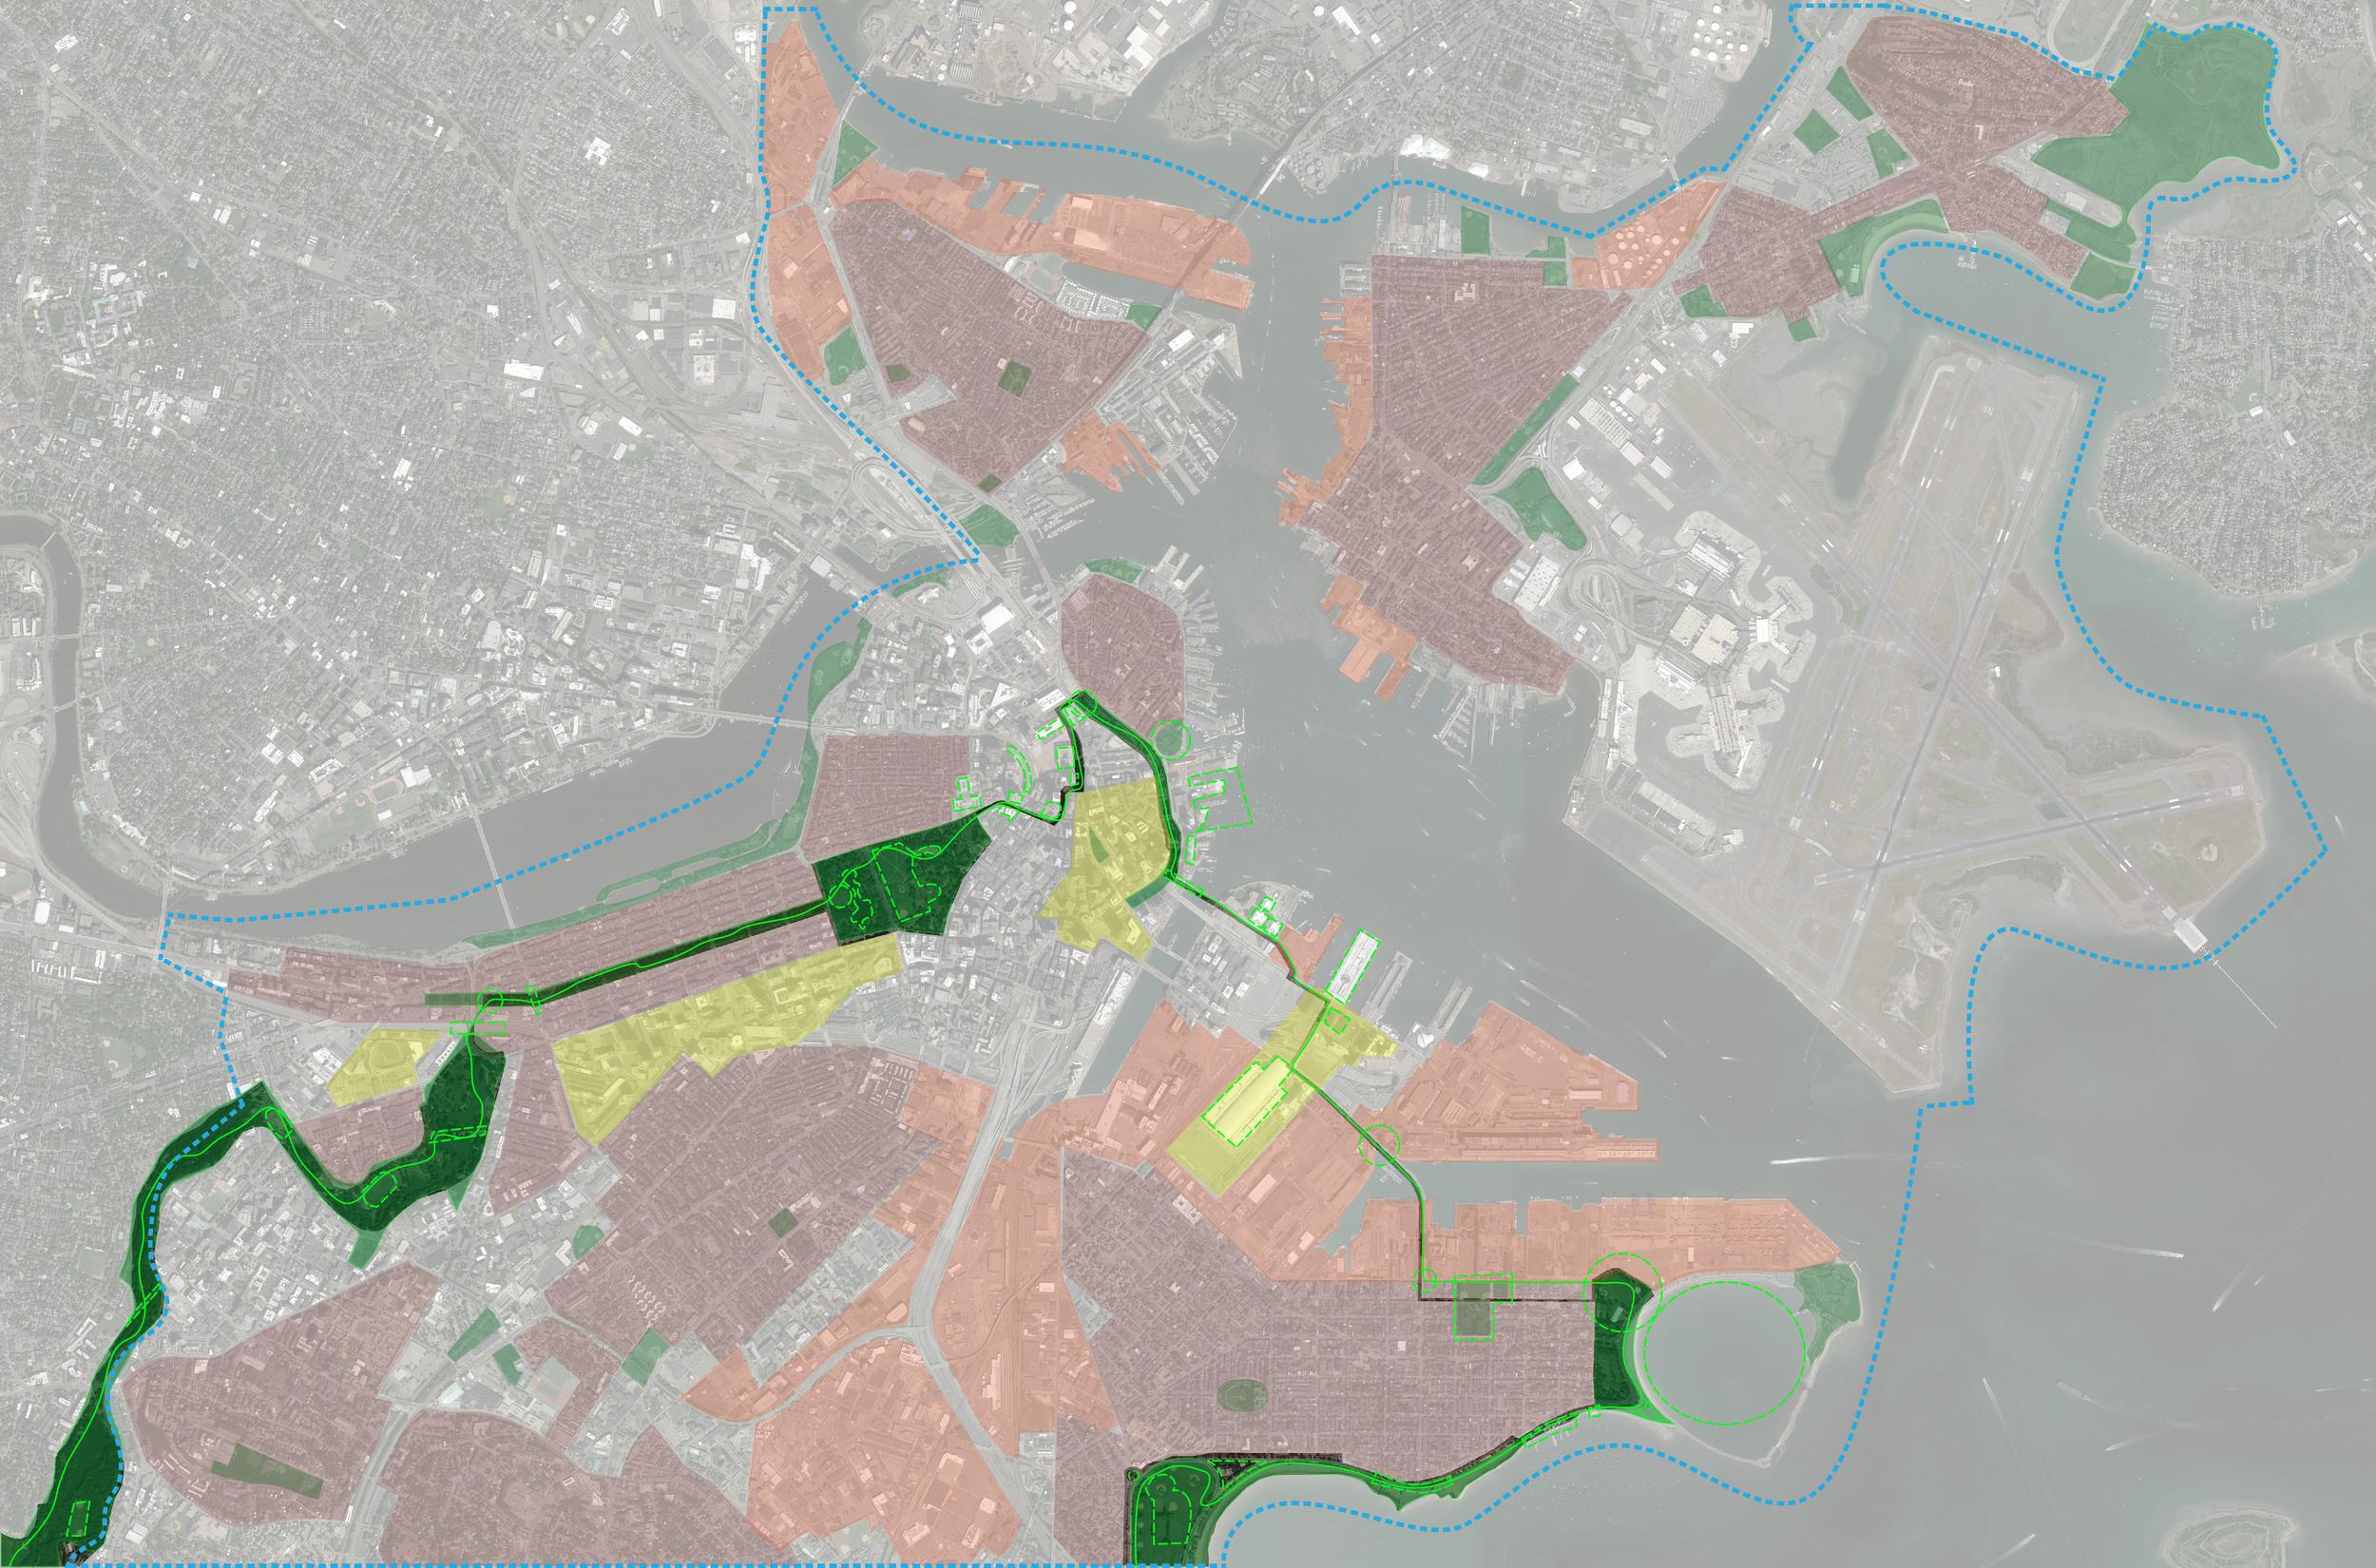 Biker (recreational) narrative on hyper-world map of Boston